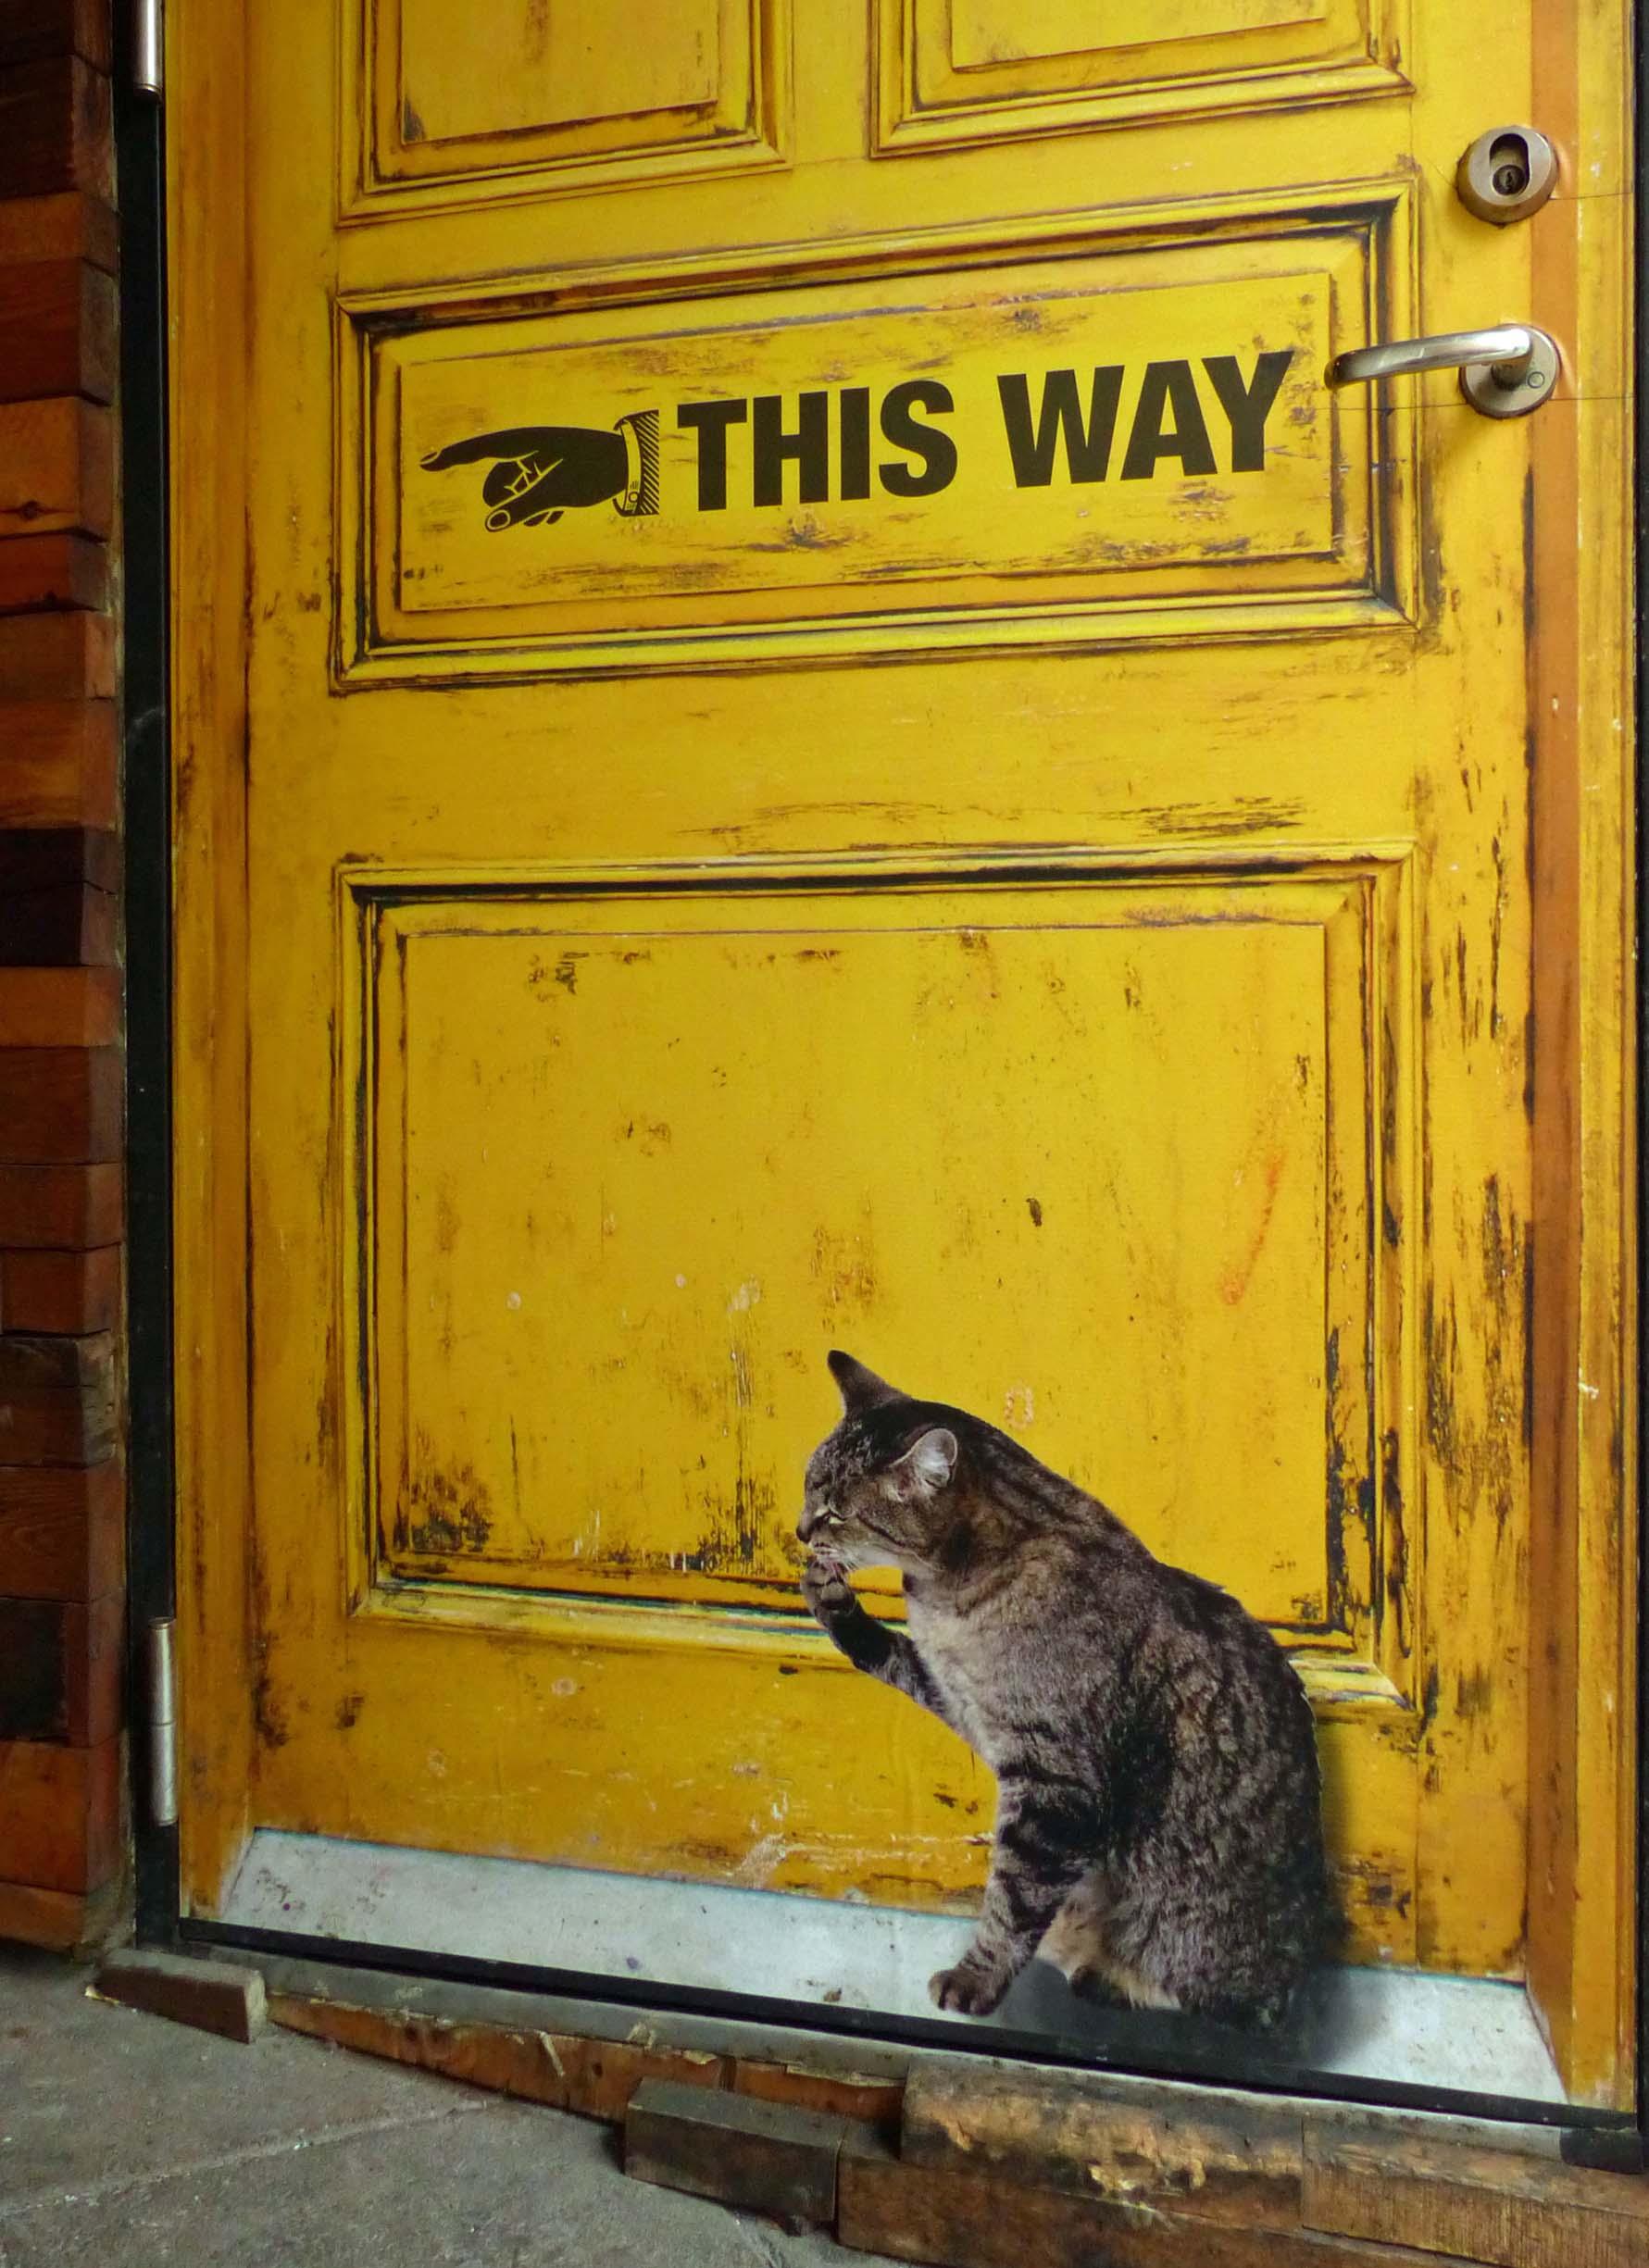 Mural of yellow door with small cat